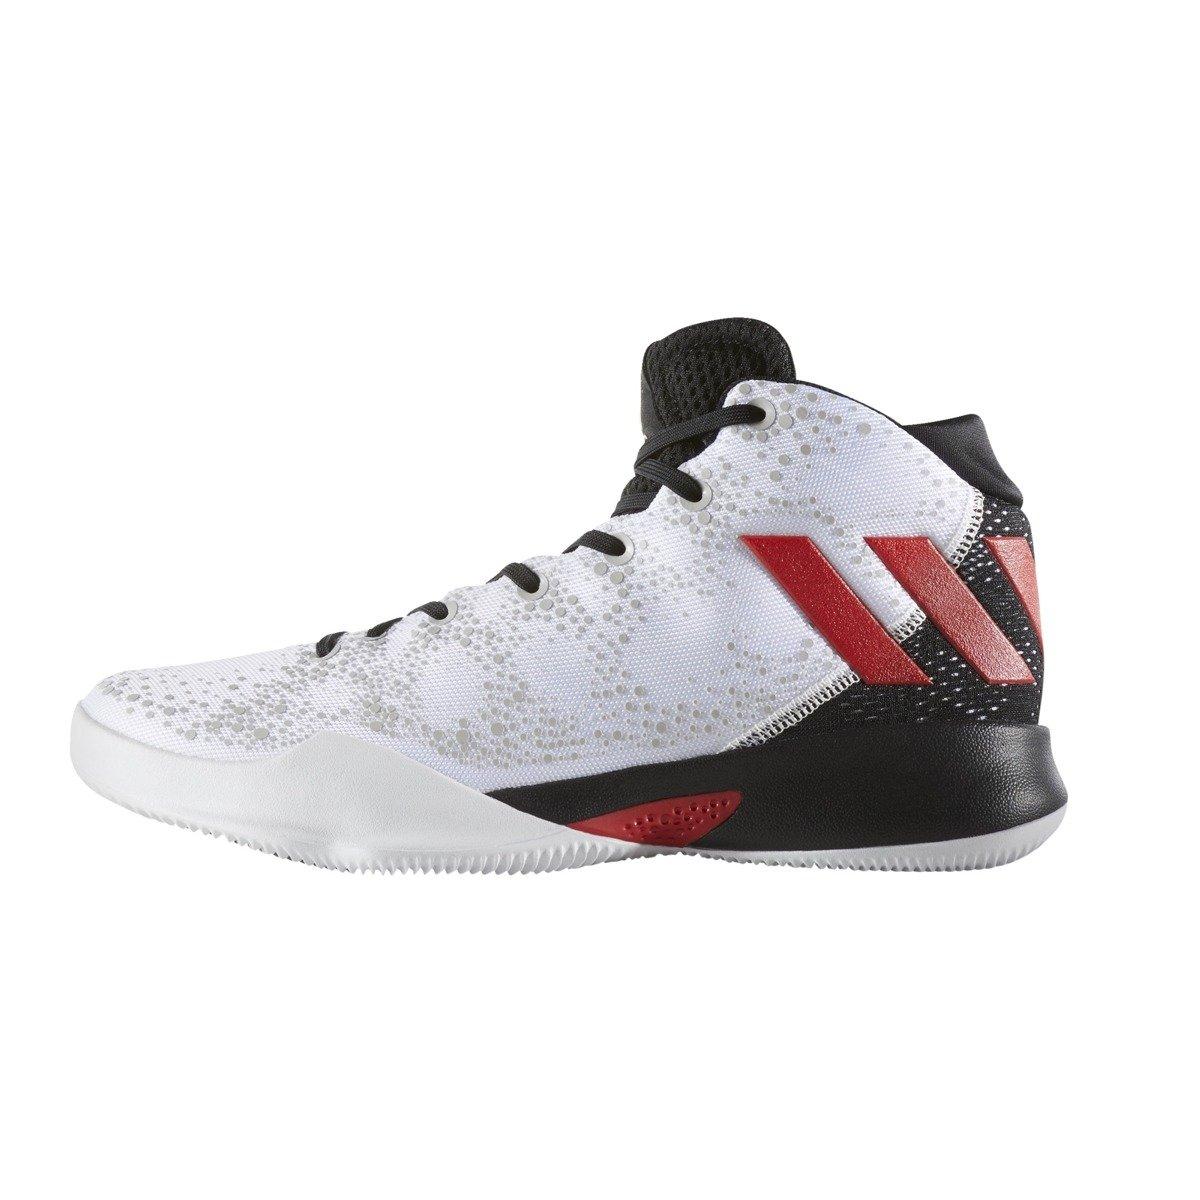 Adidas Crazy Heat Shoes BY4529 | Basketballschuhe |